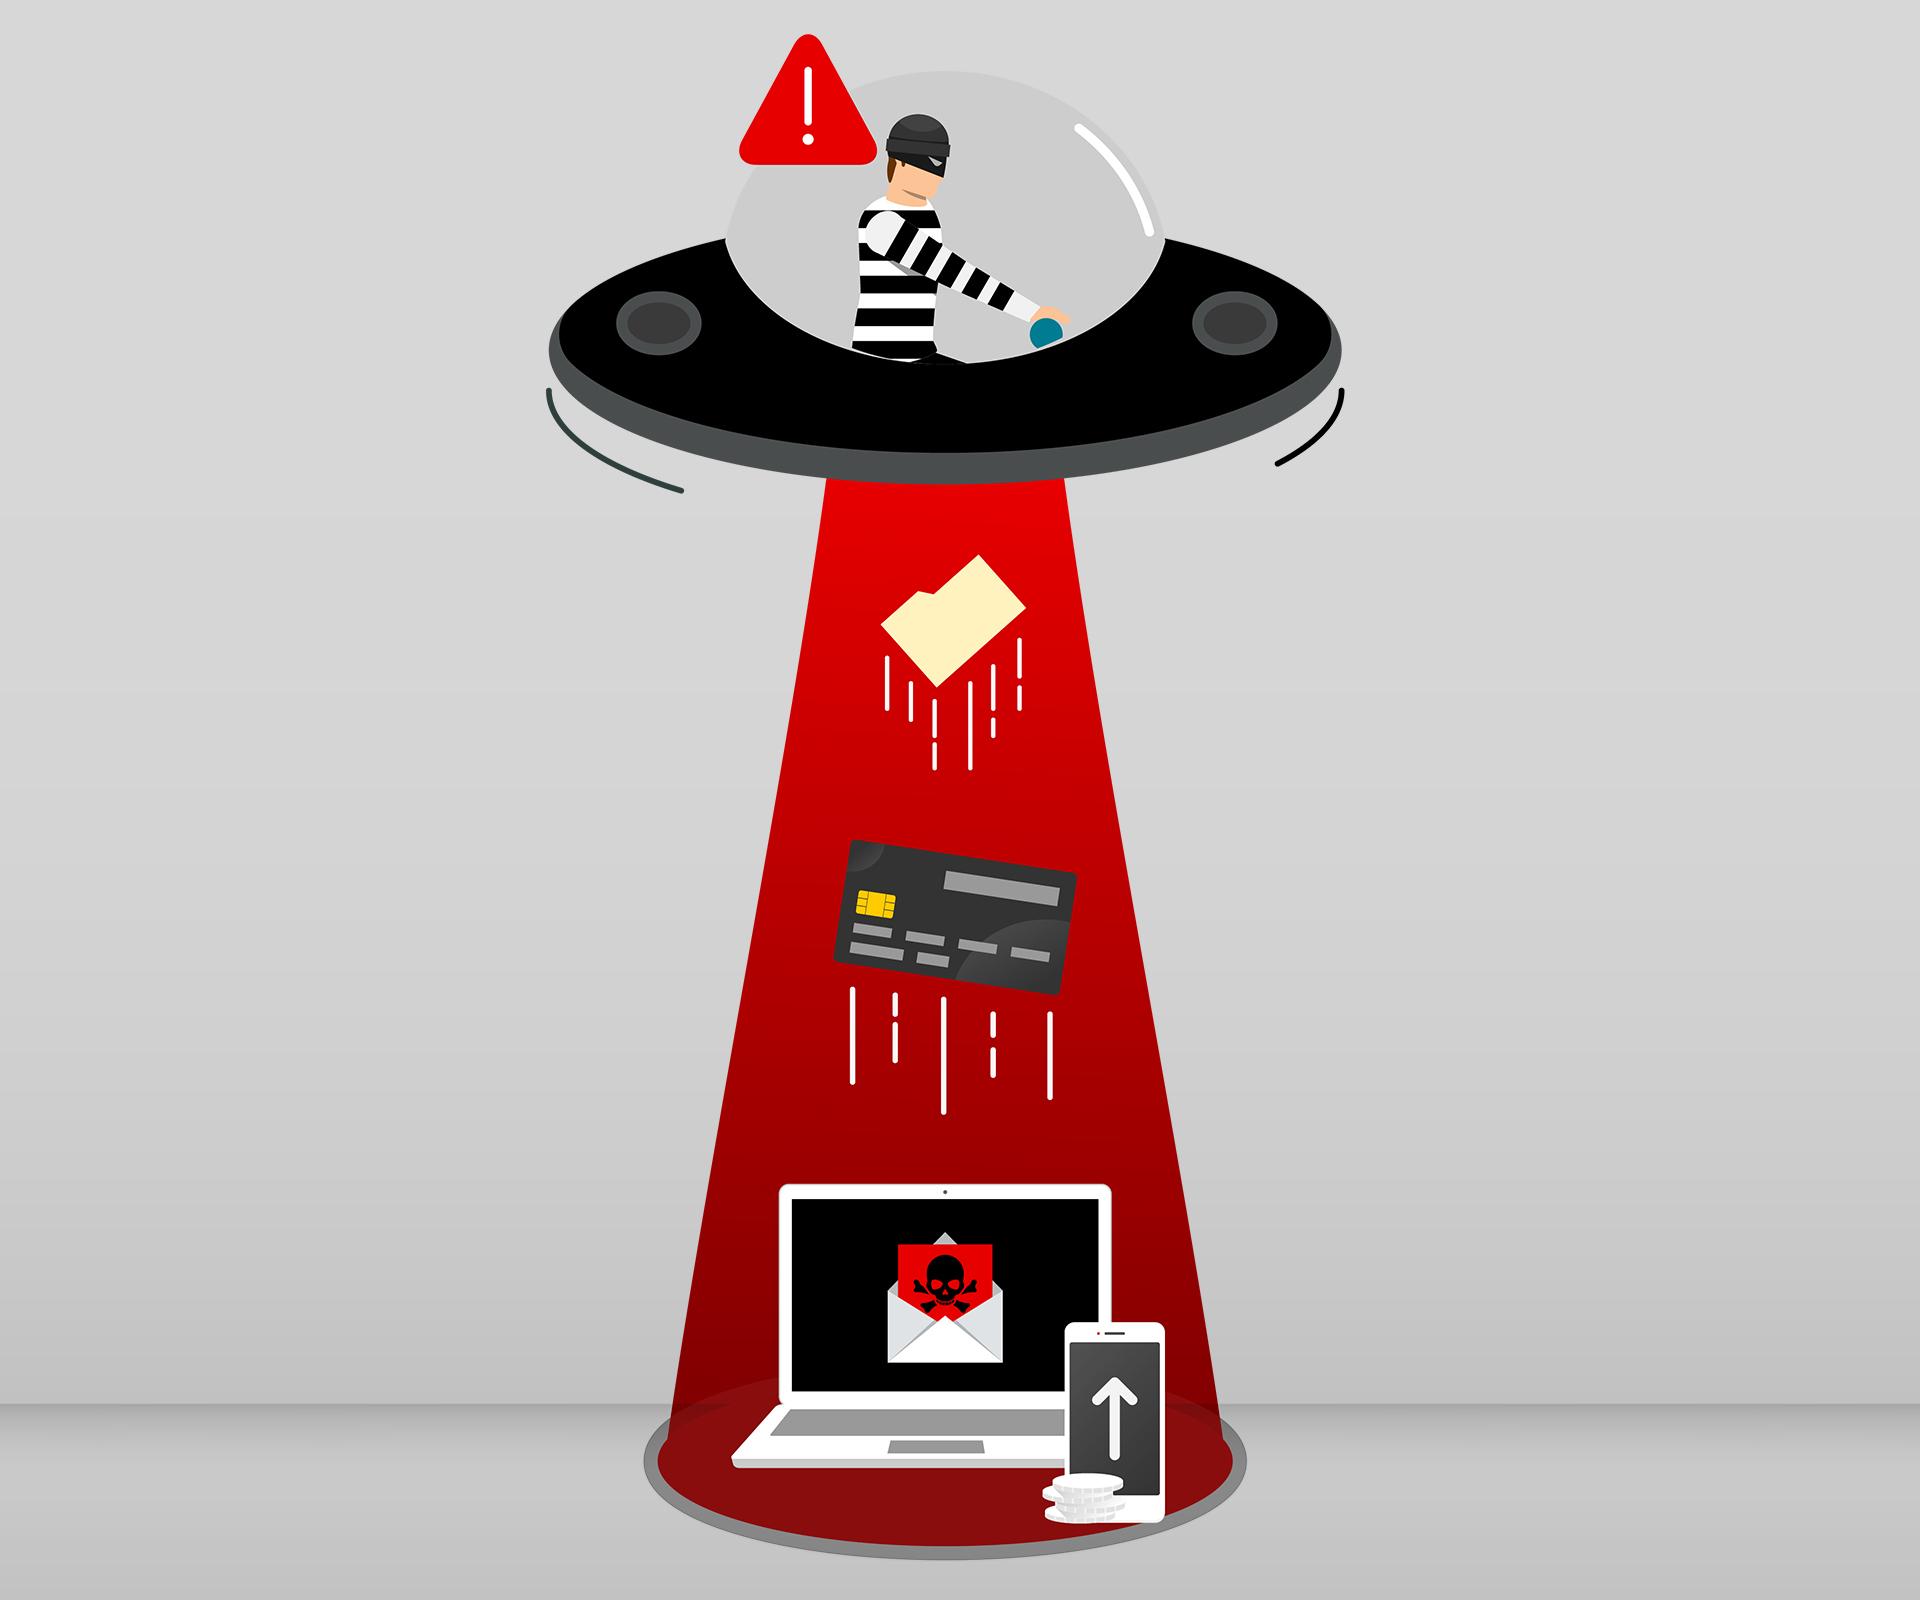 Spyware Illustration